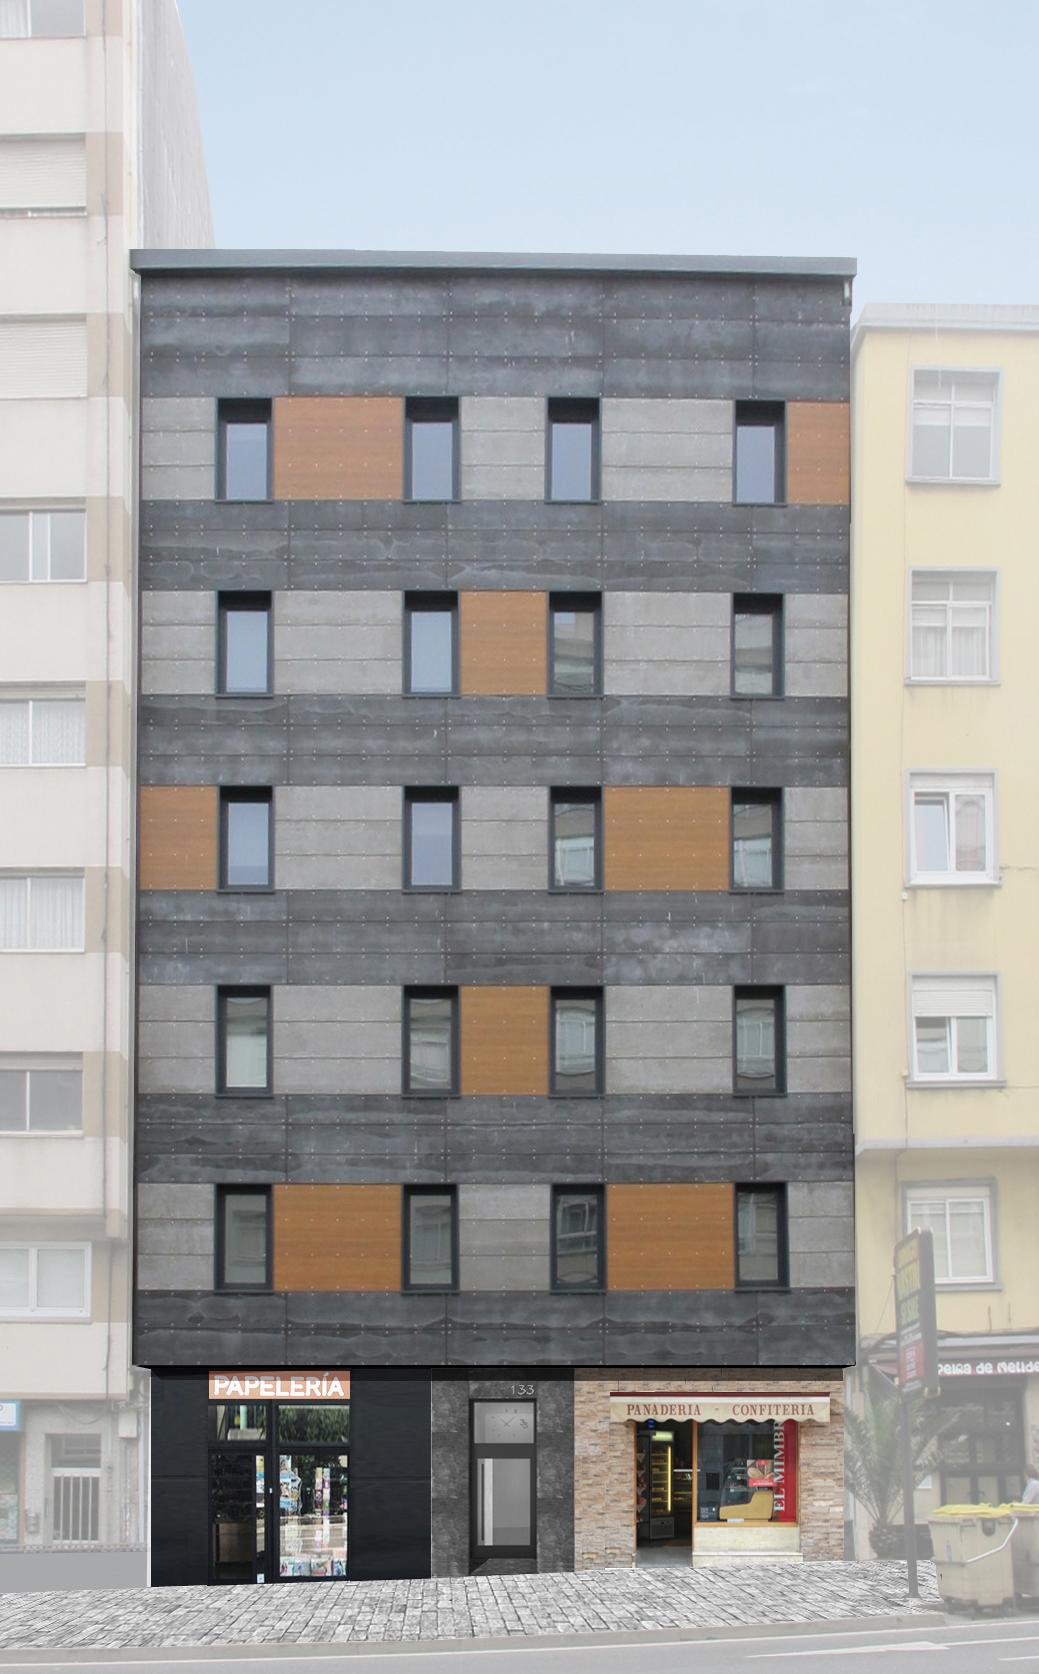 Fachadas de edificios por qu renovar la fachada en for Fachadas de viviendas